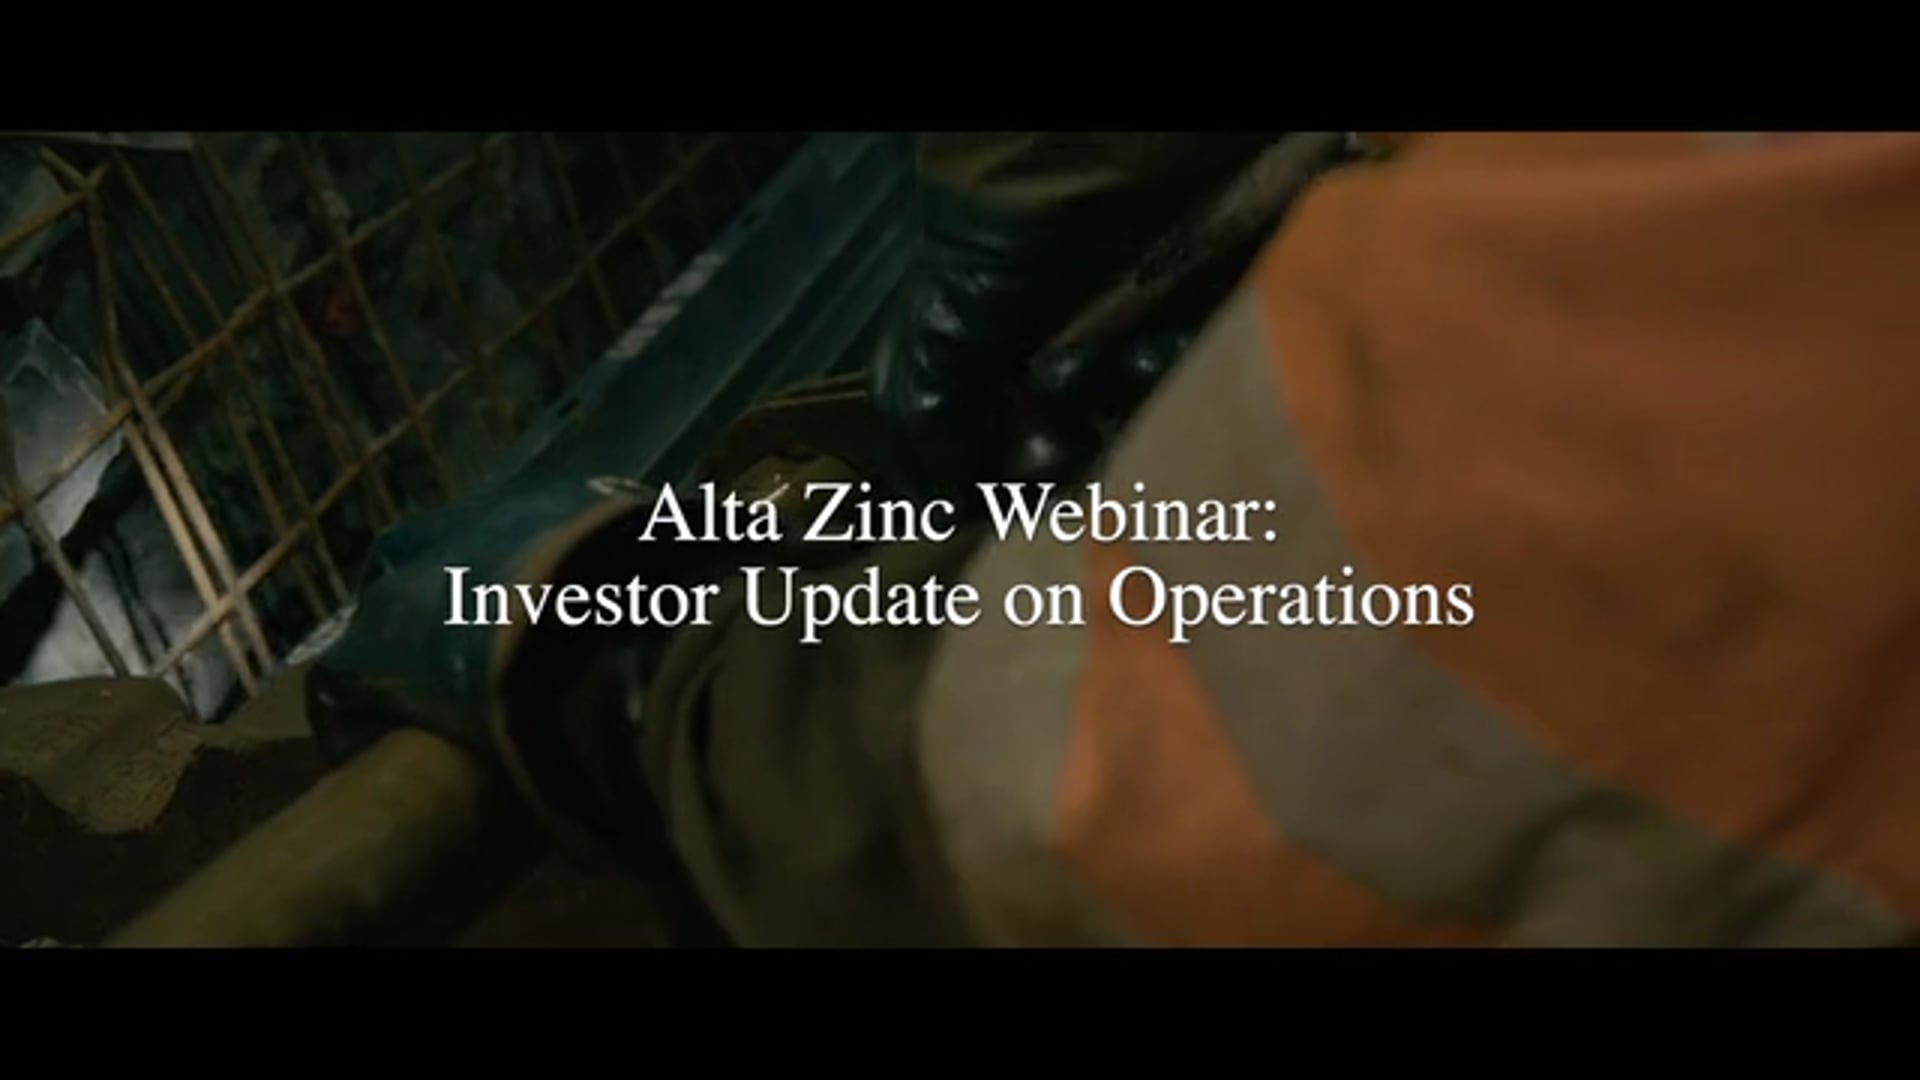 Alta Zinc Webinar: Investor Update on Operations